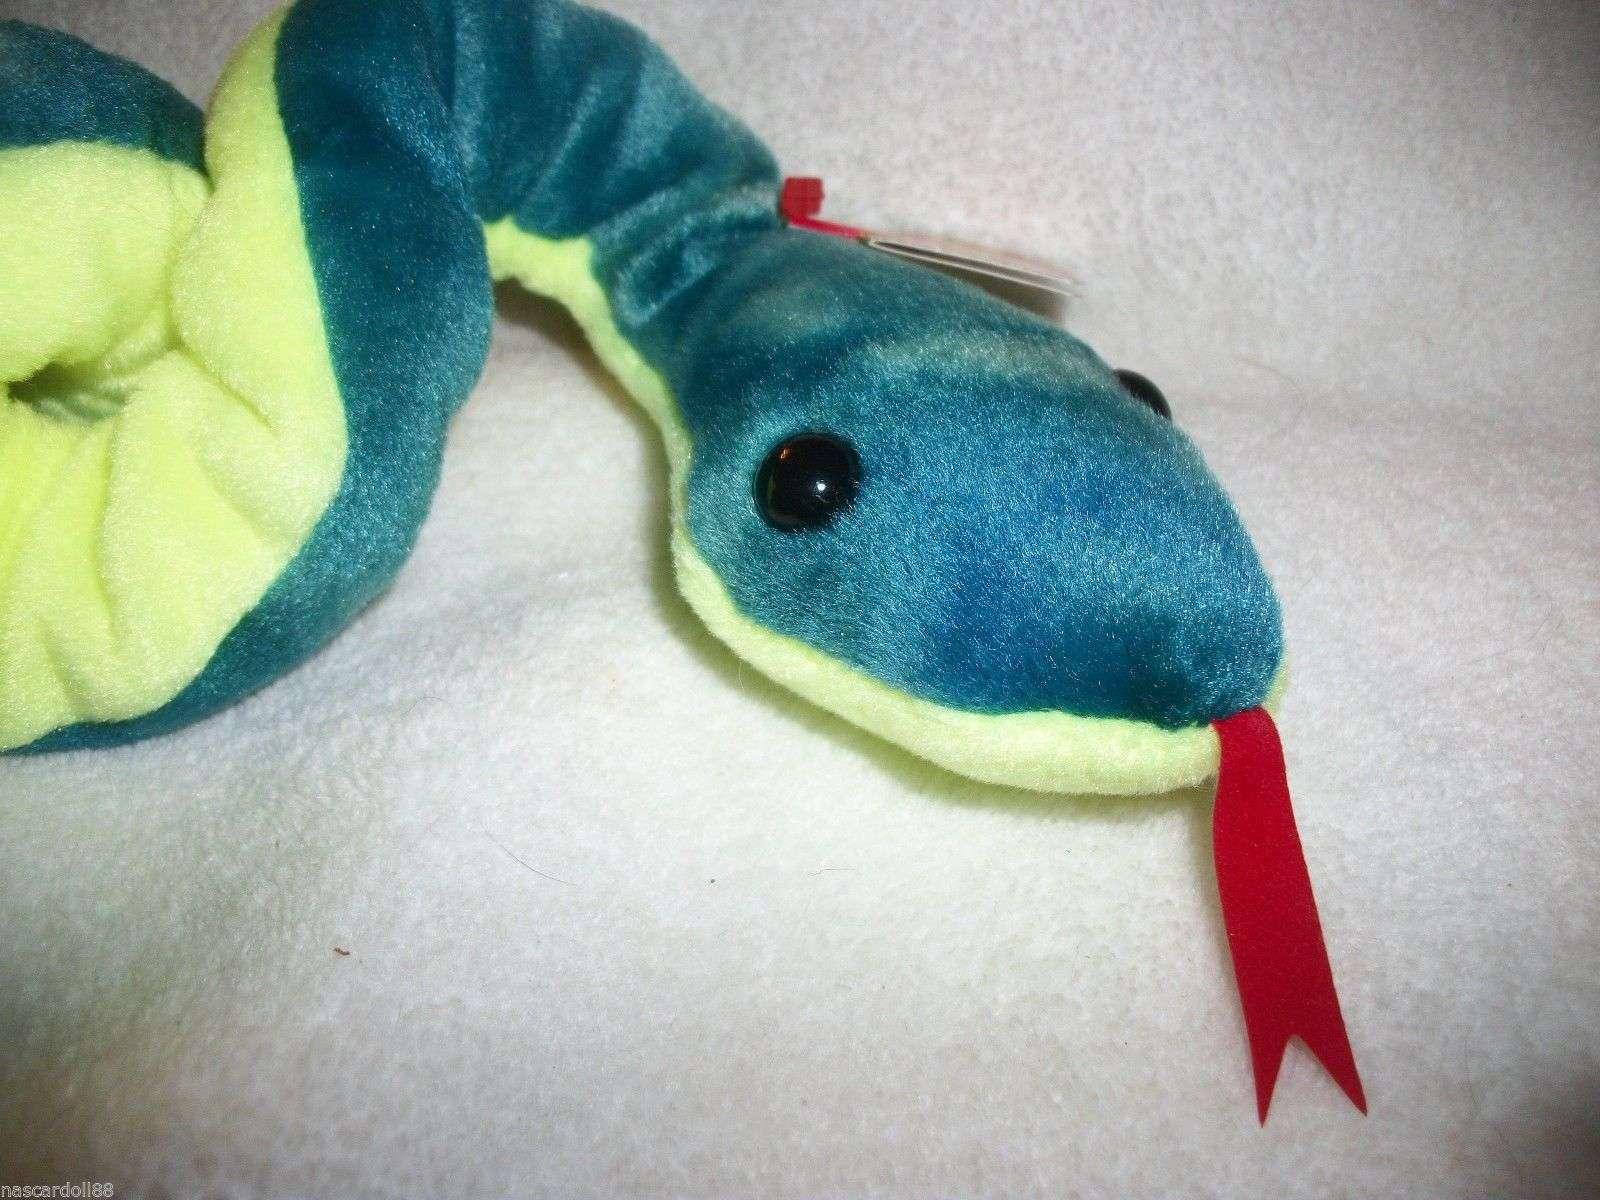 a5b576c218c TY Beanie Babies Hissy the snake Bean Stuffed Plush Animal stocking stuffer  For Sale - Item  255760